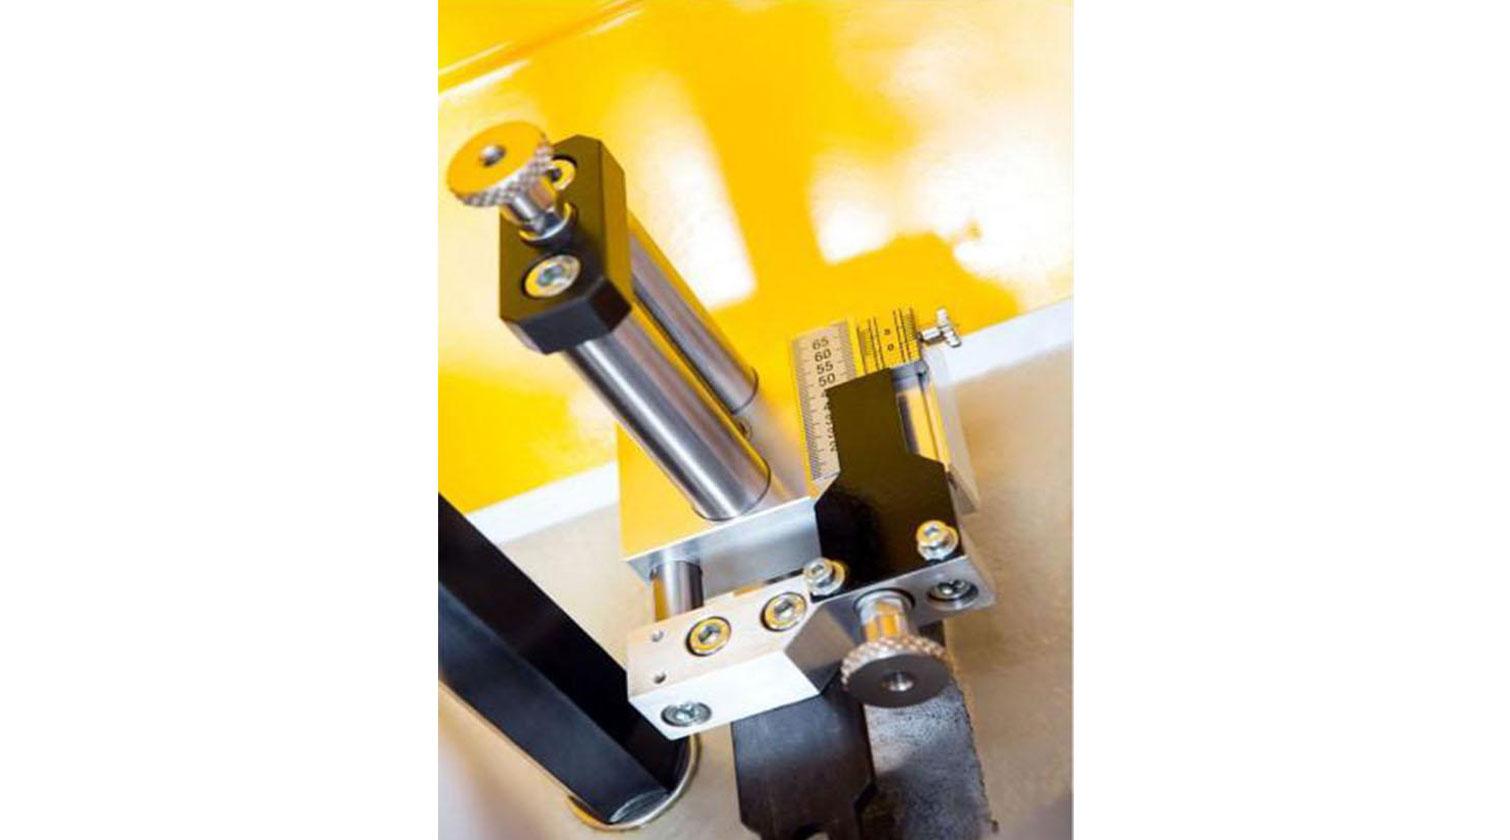 INT aluminum corner crimper Yilmaz KP 110 micrometric adjustment